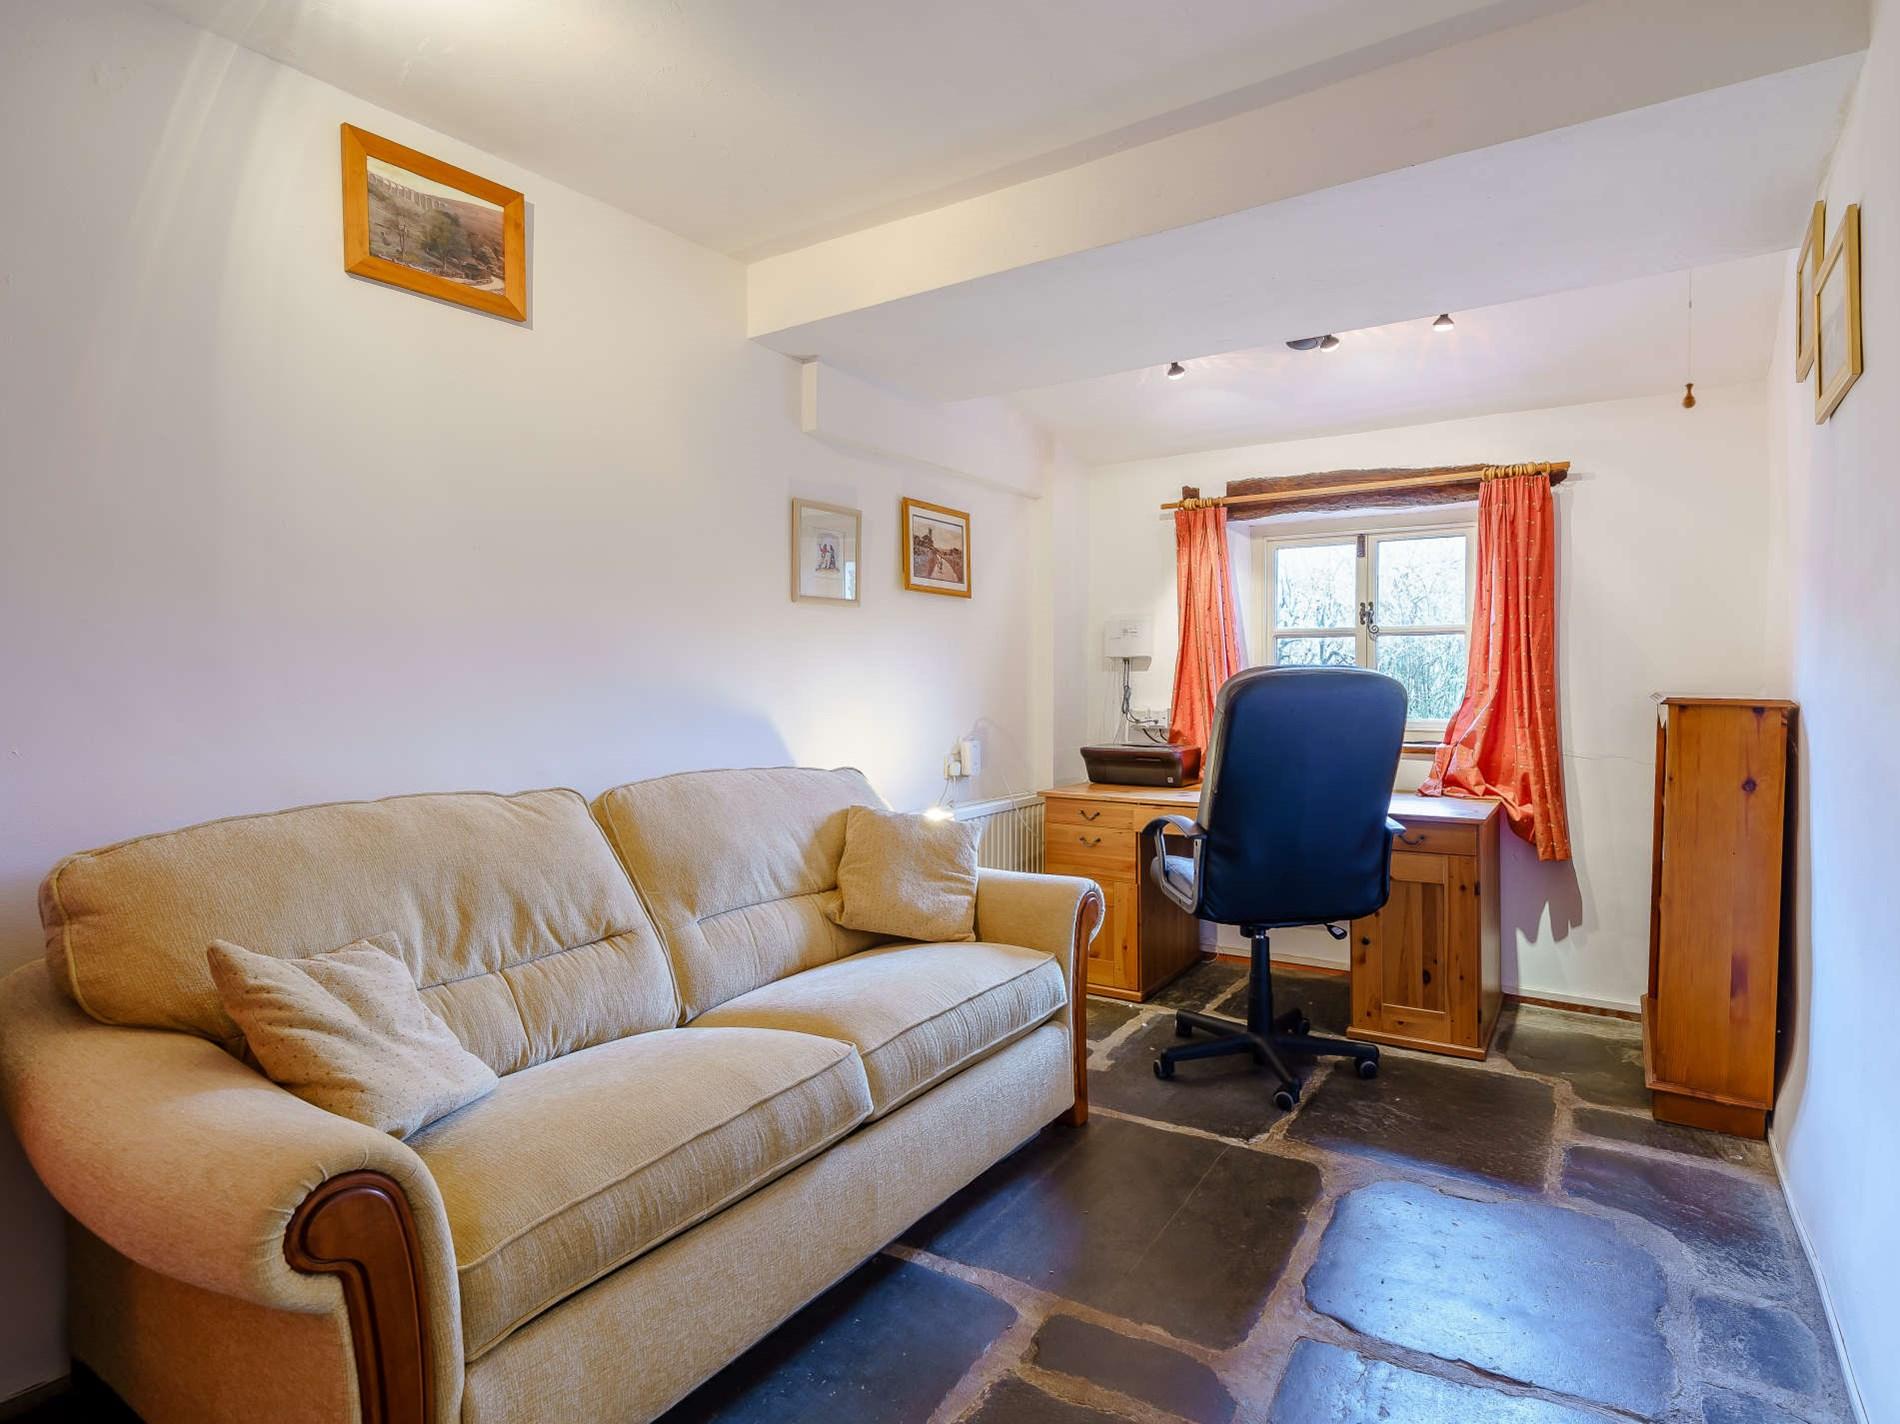 4 Bedroom Cottage in Sedbergh, Scottish Borders